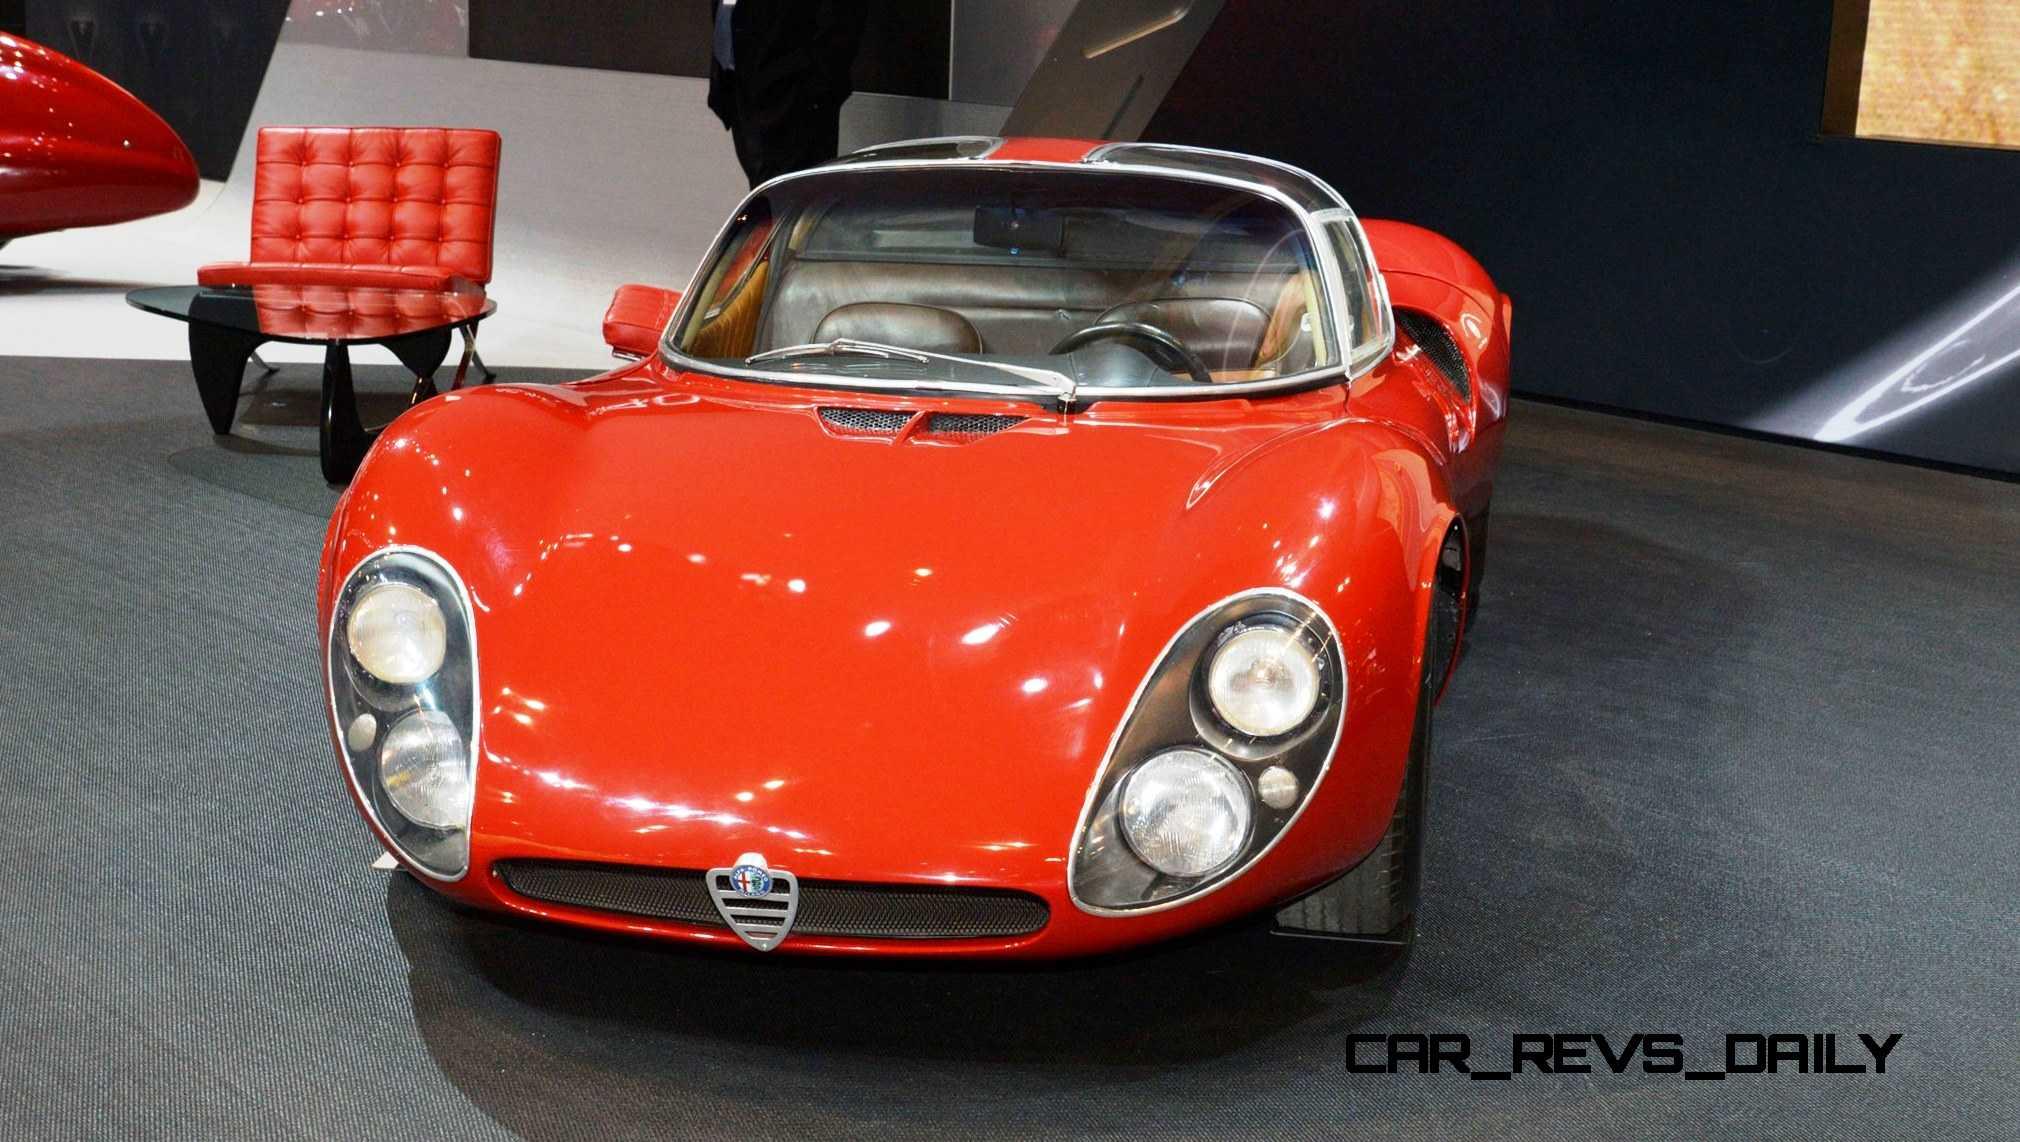 2015 chicago auto show mega gallery - Auto motor show ...